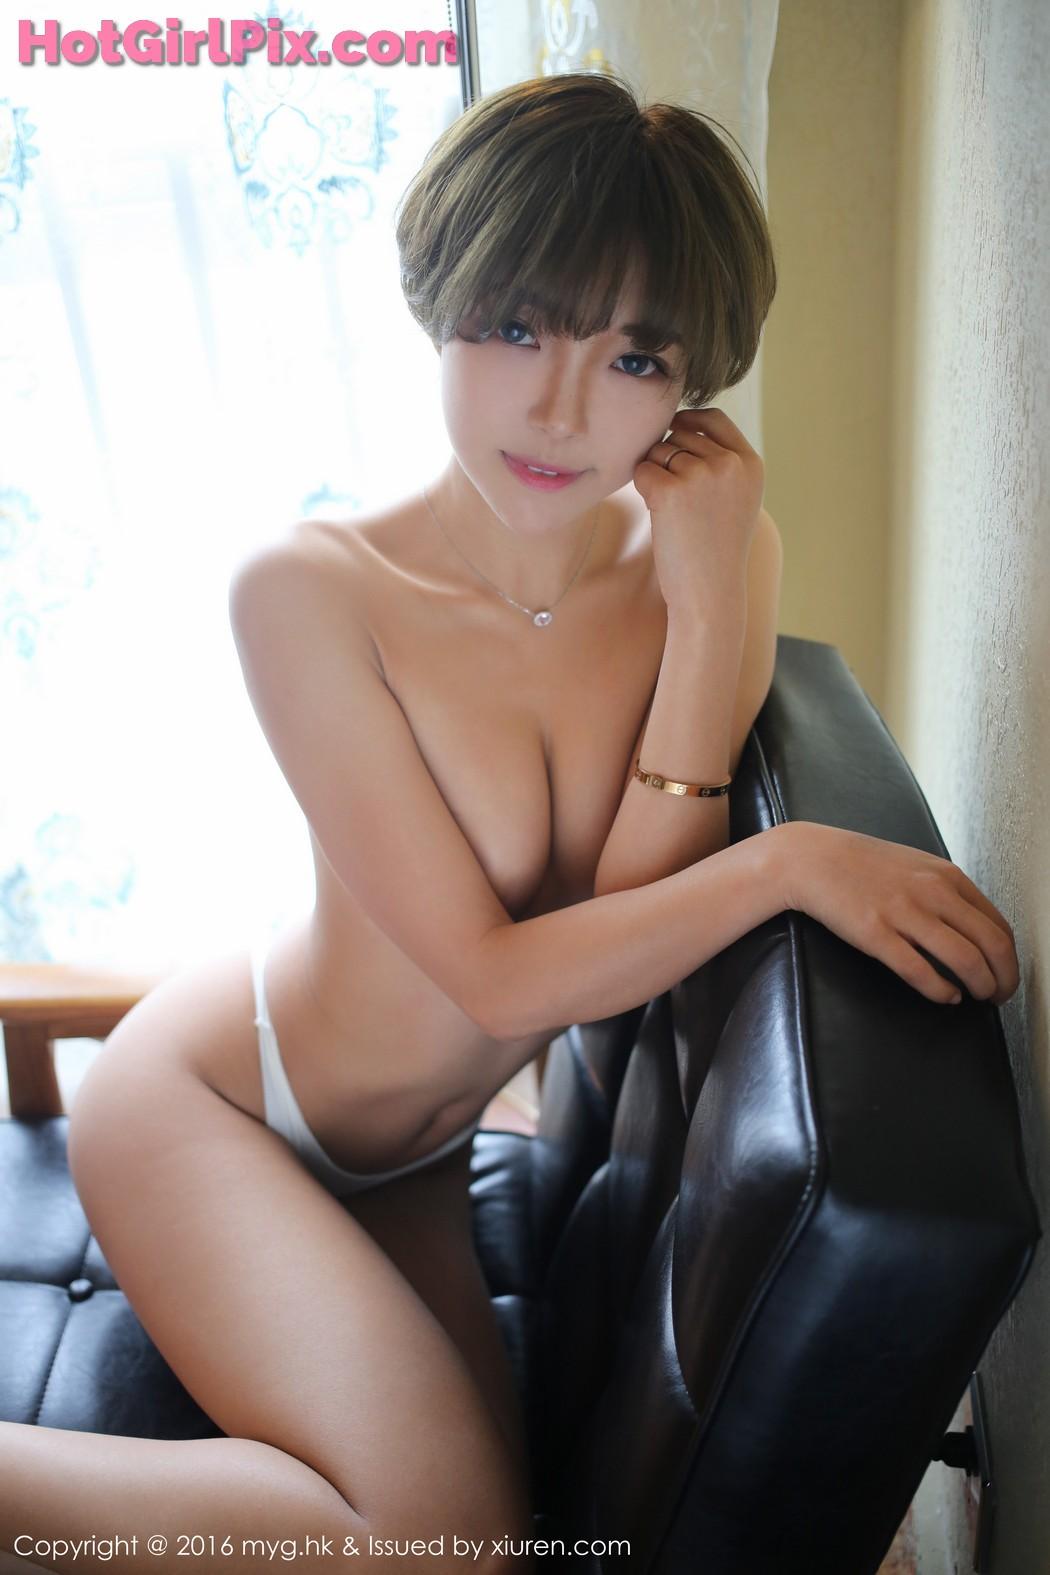 MYG20160426VOL0204